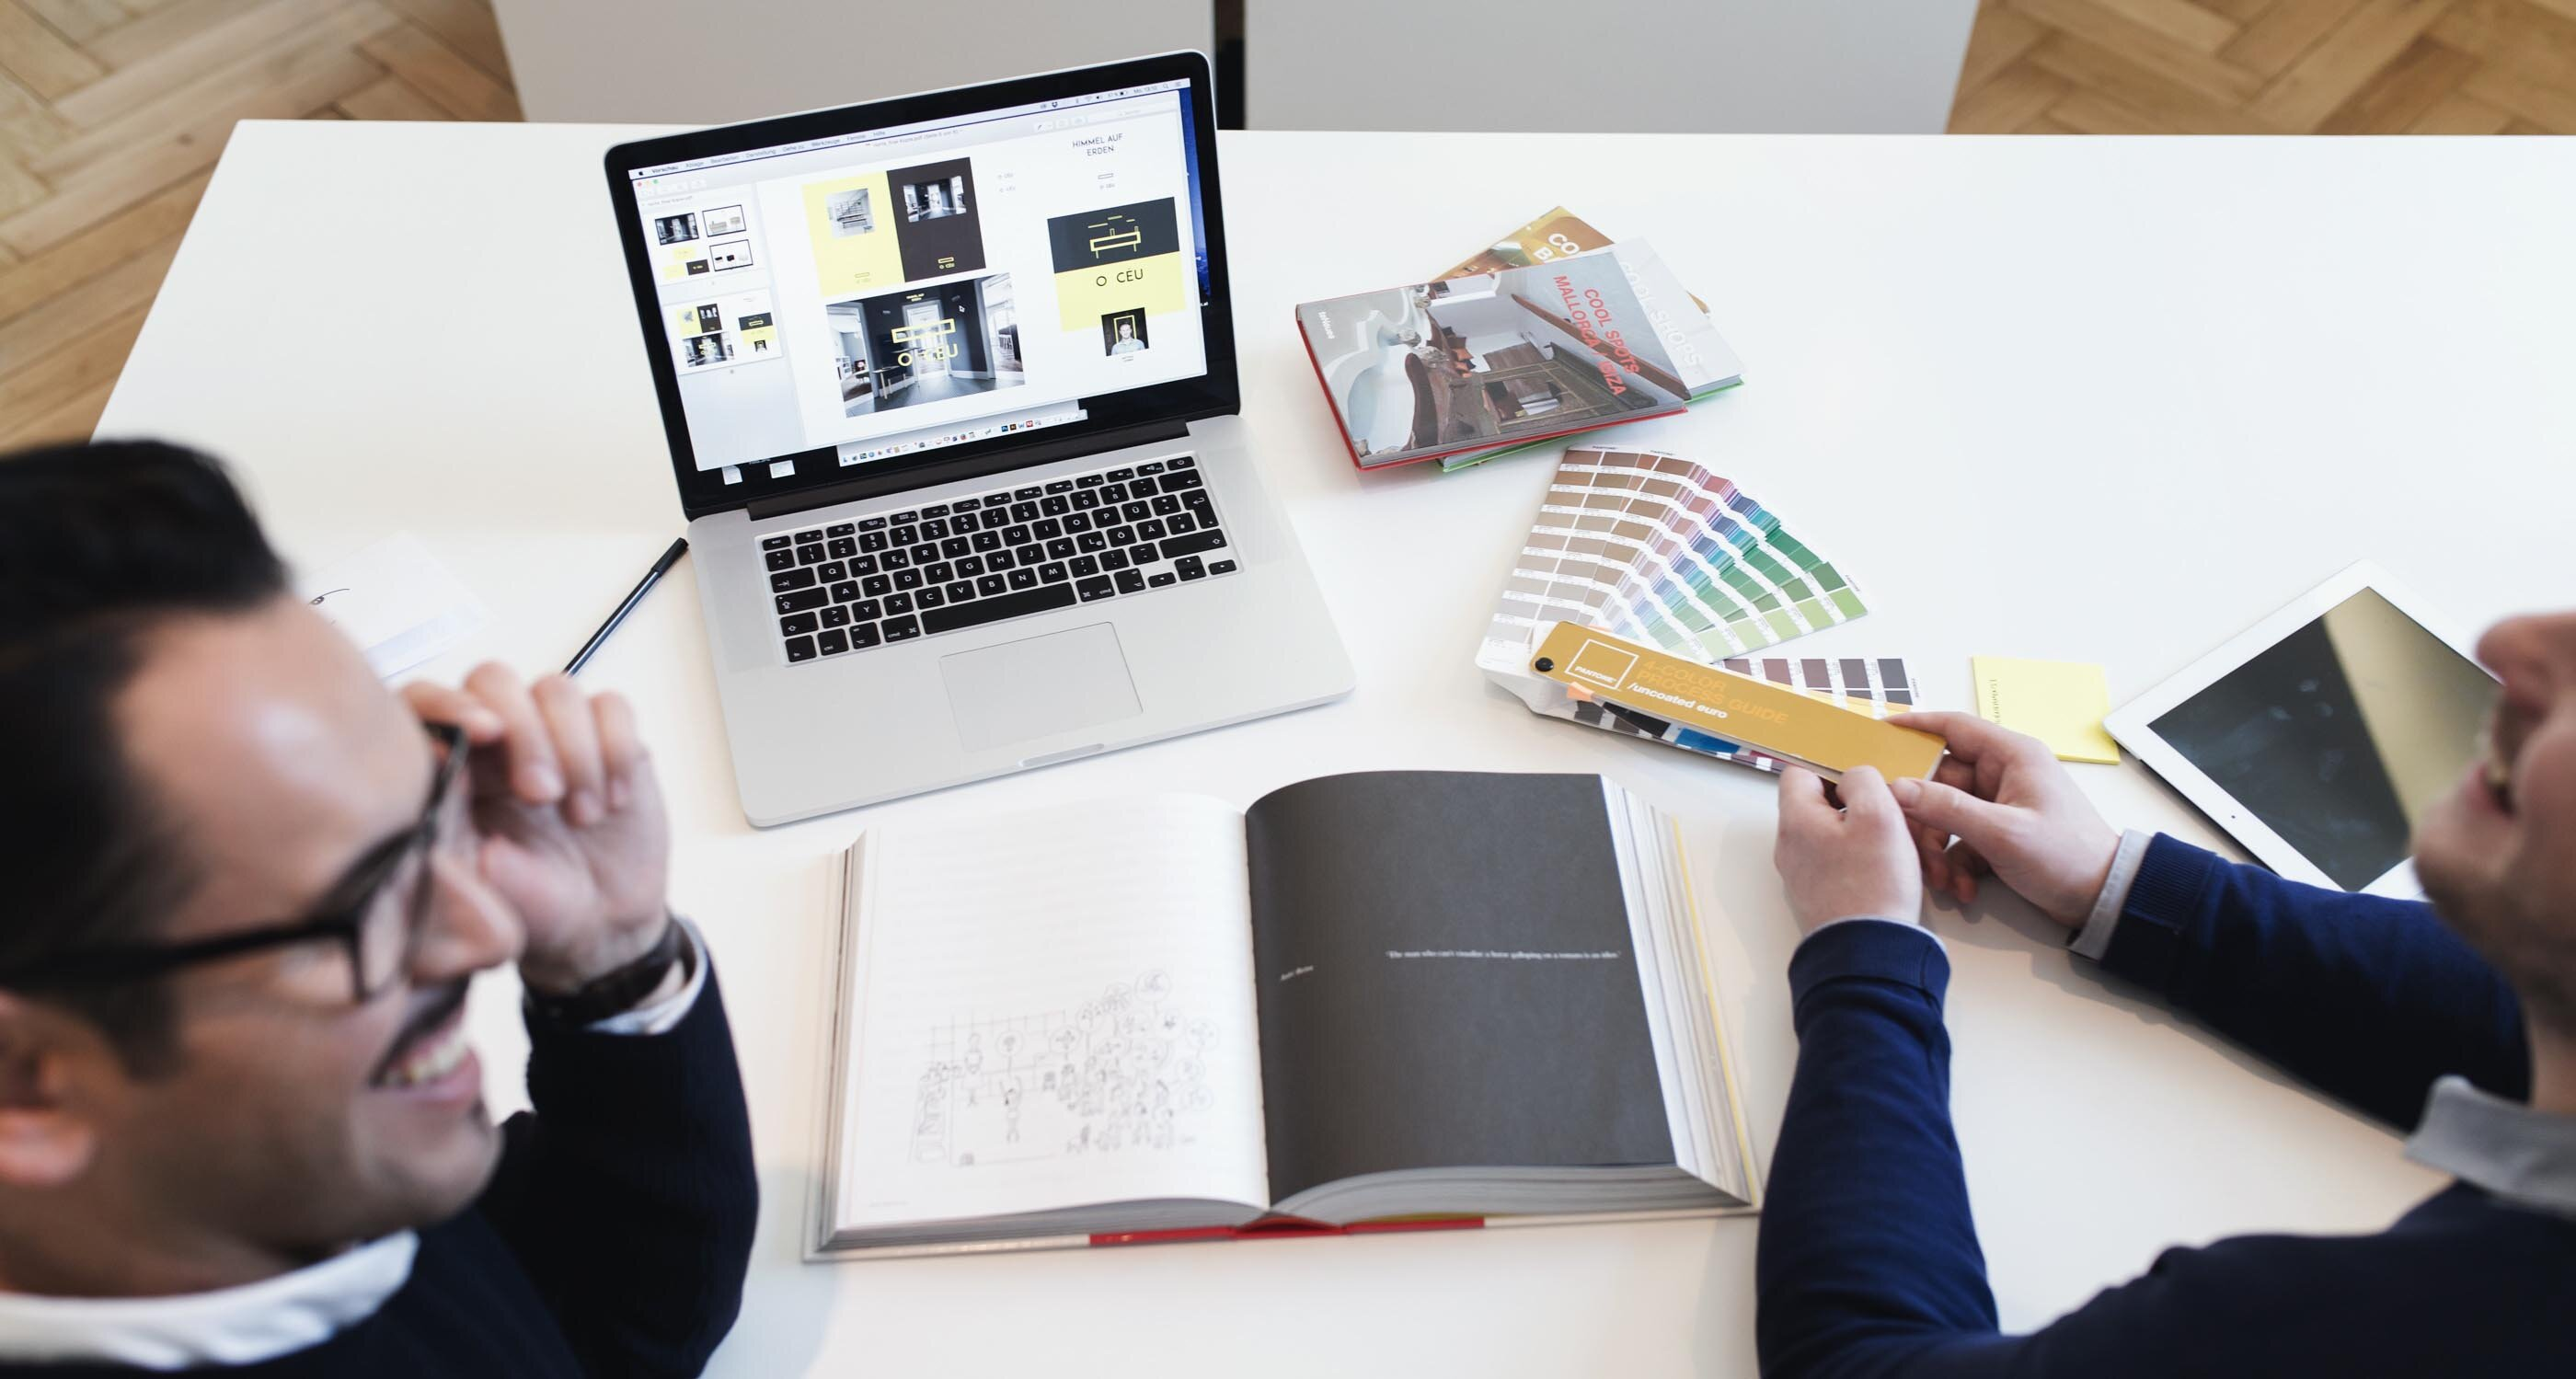 dein praktikum als digital designer in m nchen. Black Bedroom Furniture Sets. Home Design Ideas